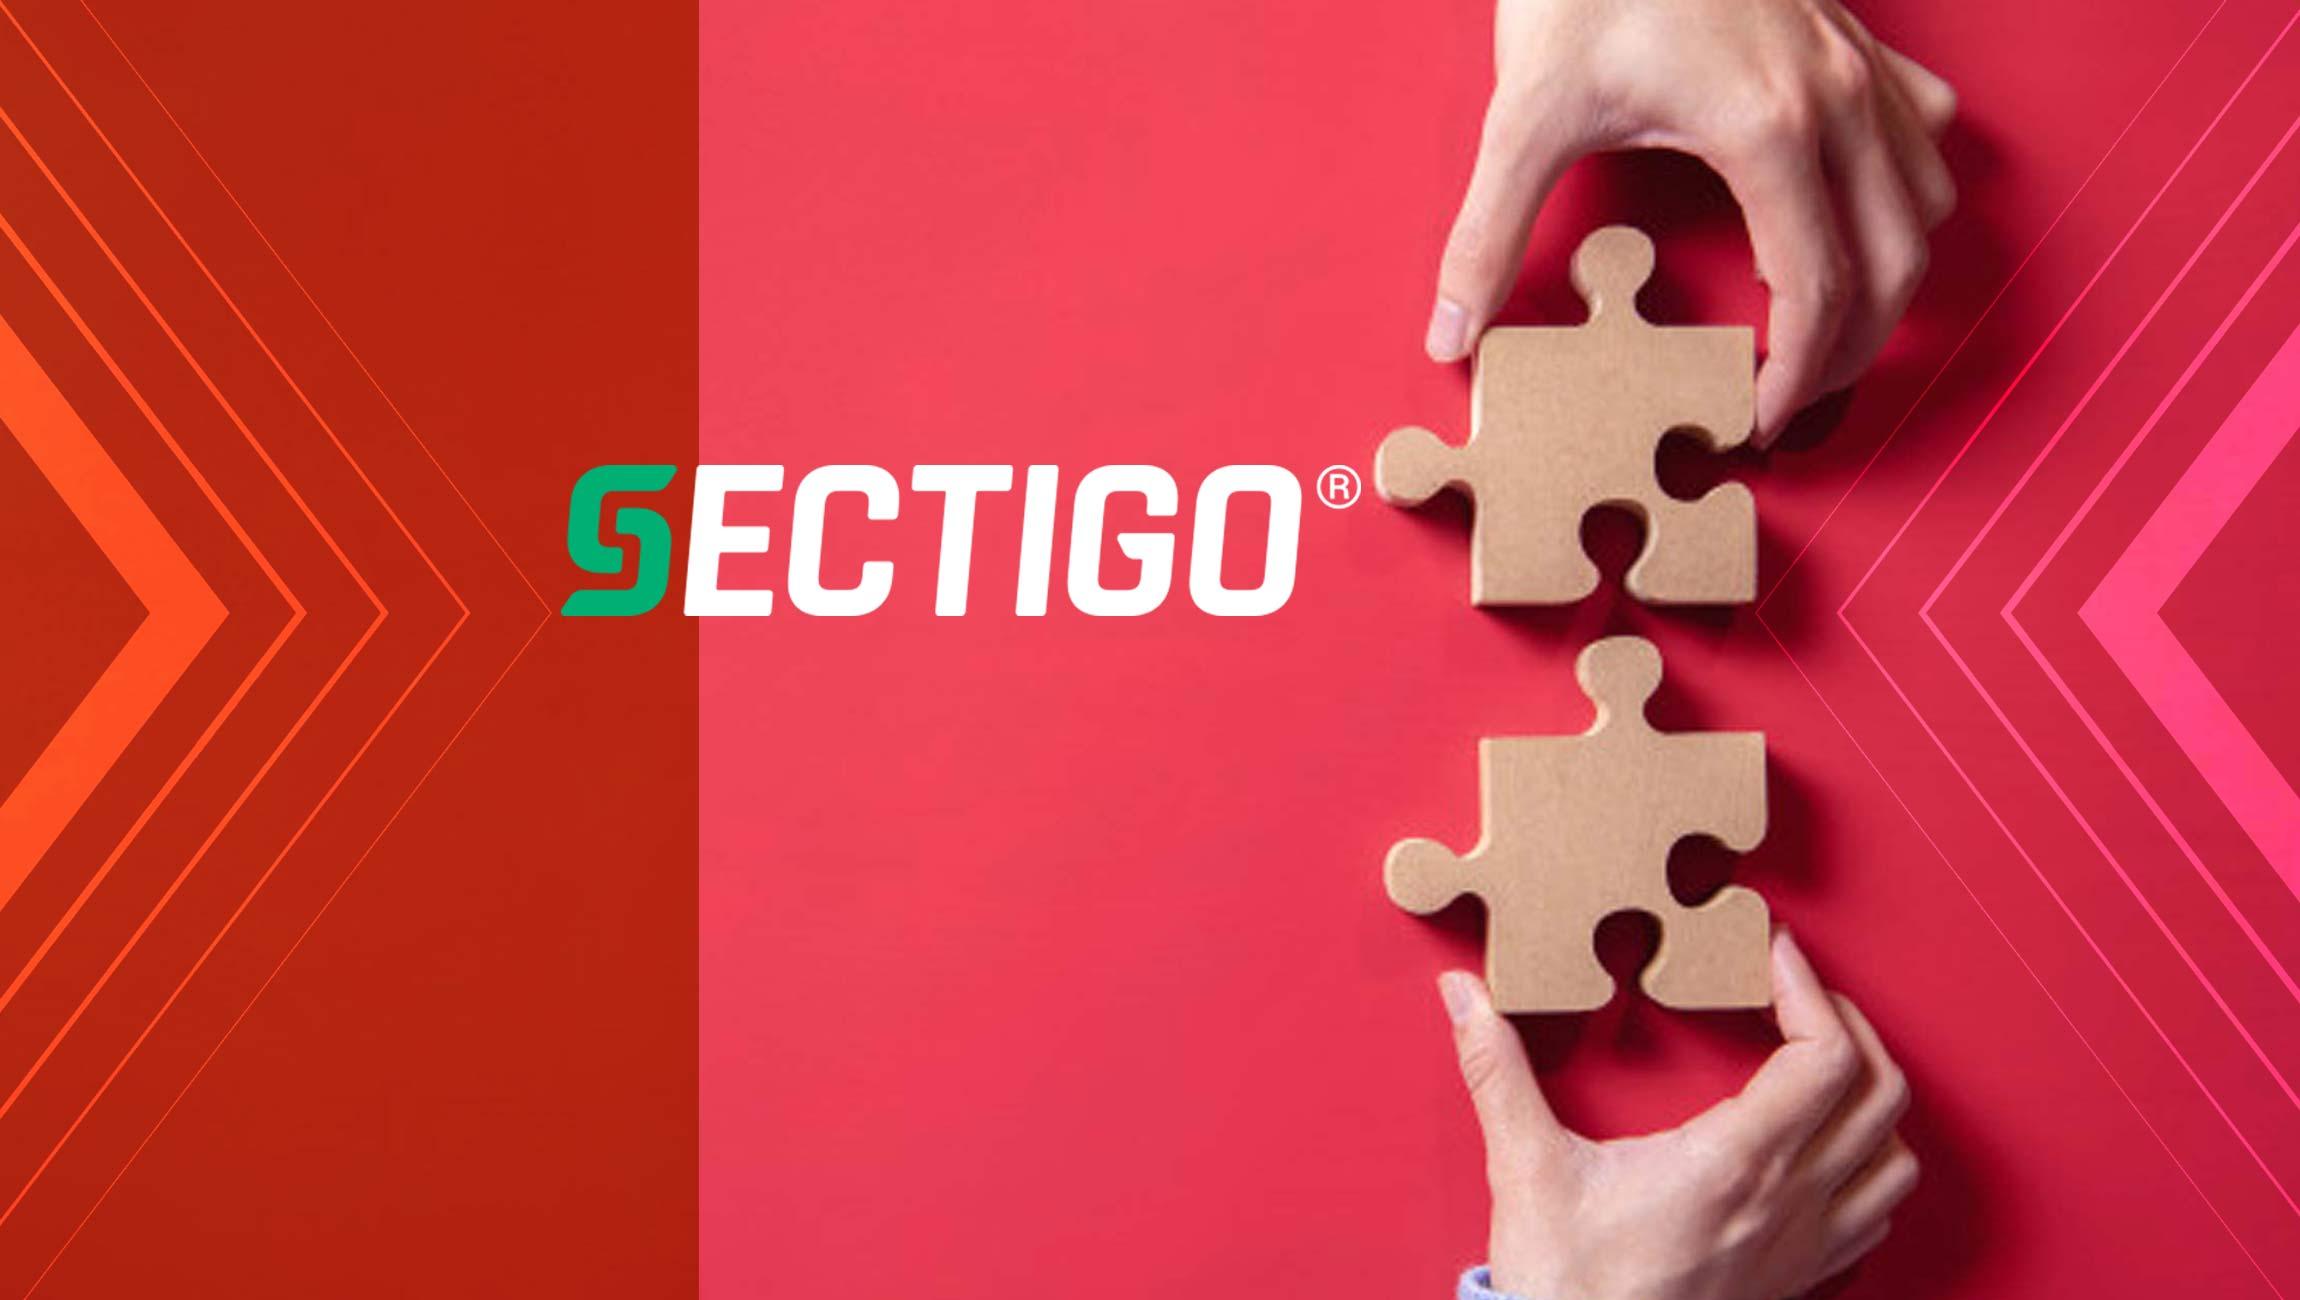 Sectigo Launches Secure Partner Program 5